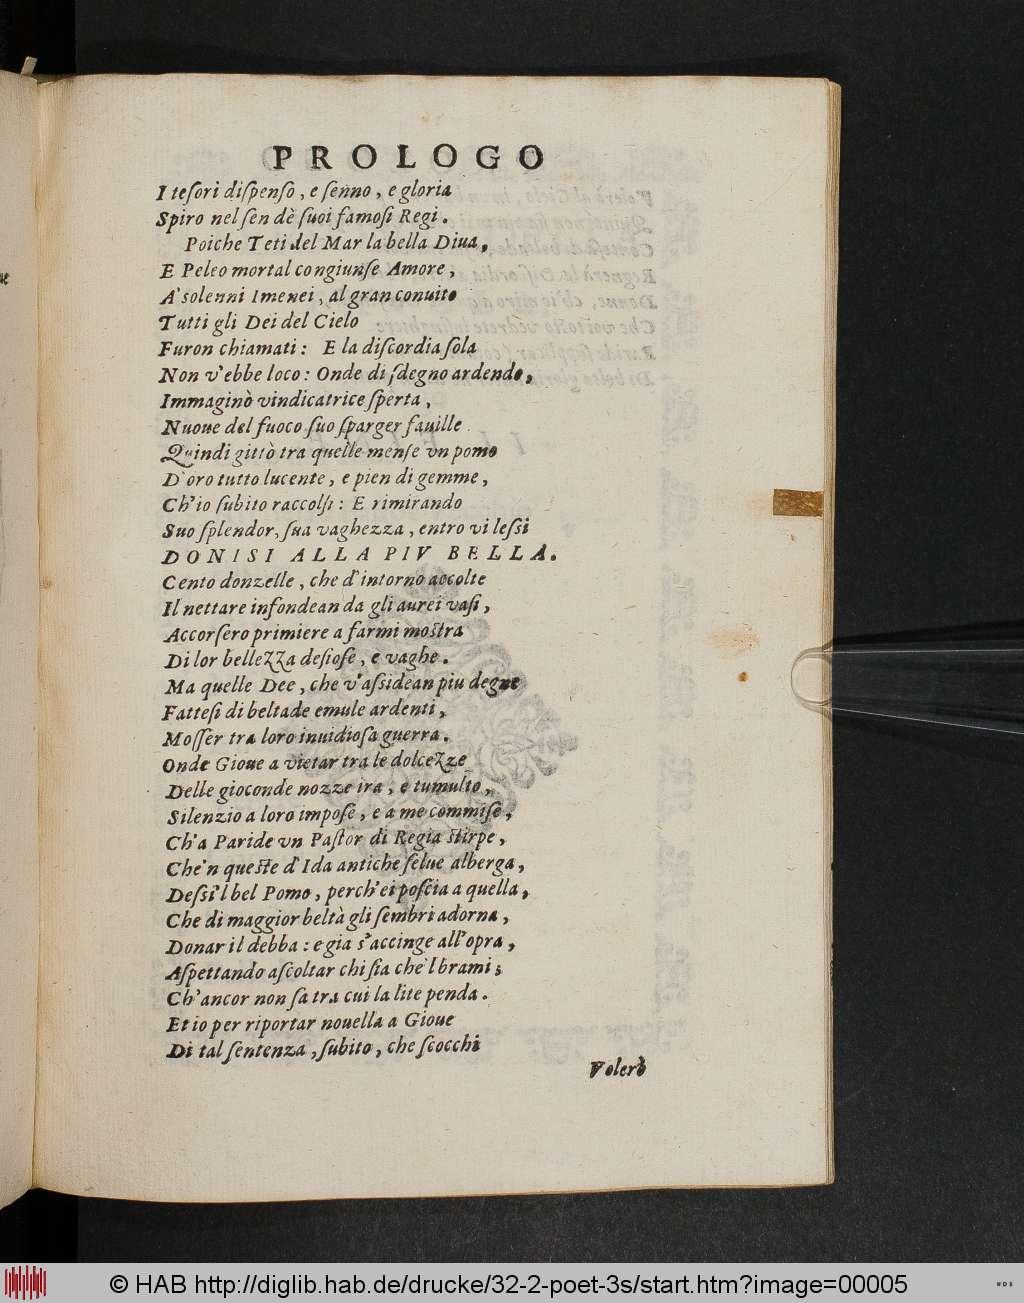 http://diglib.hab.de/drucke/32-2-poet-3s/00005.jpg